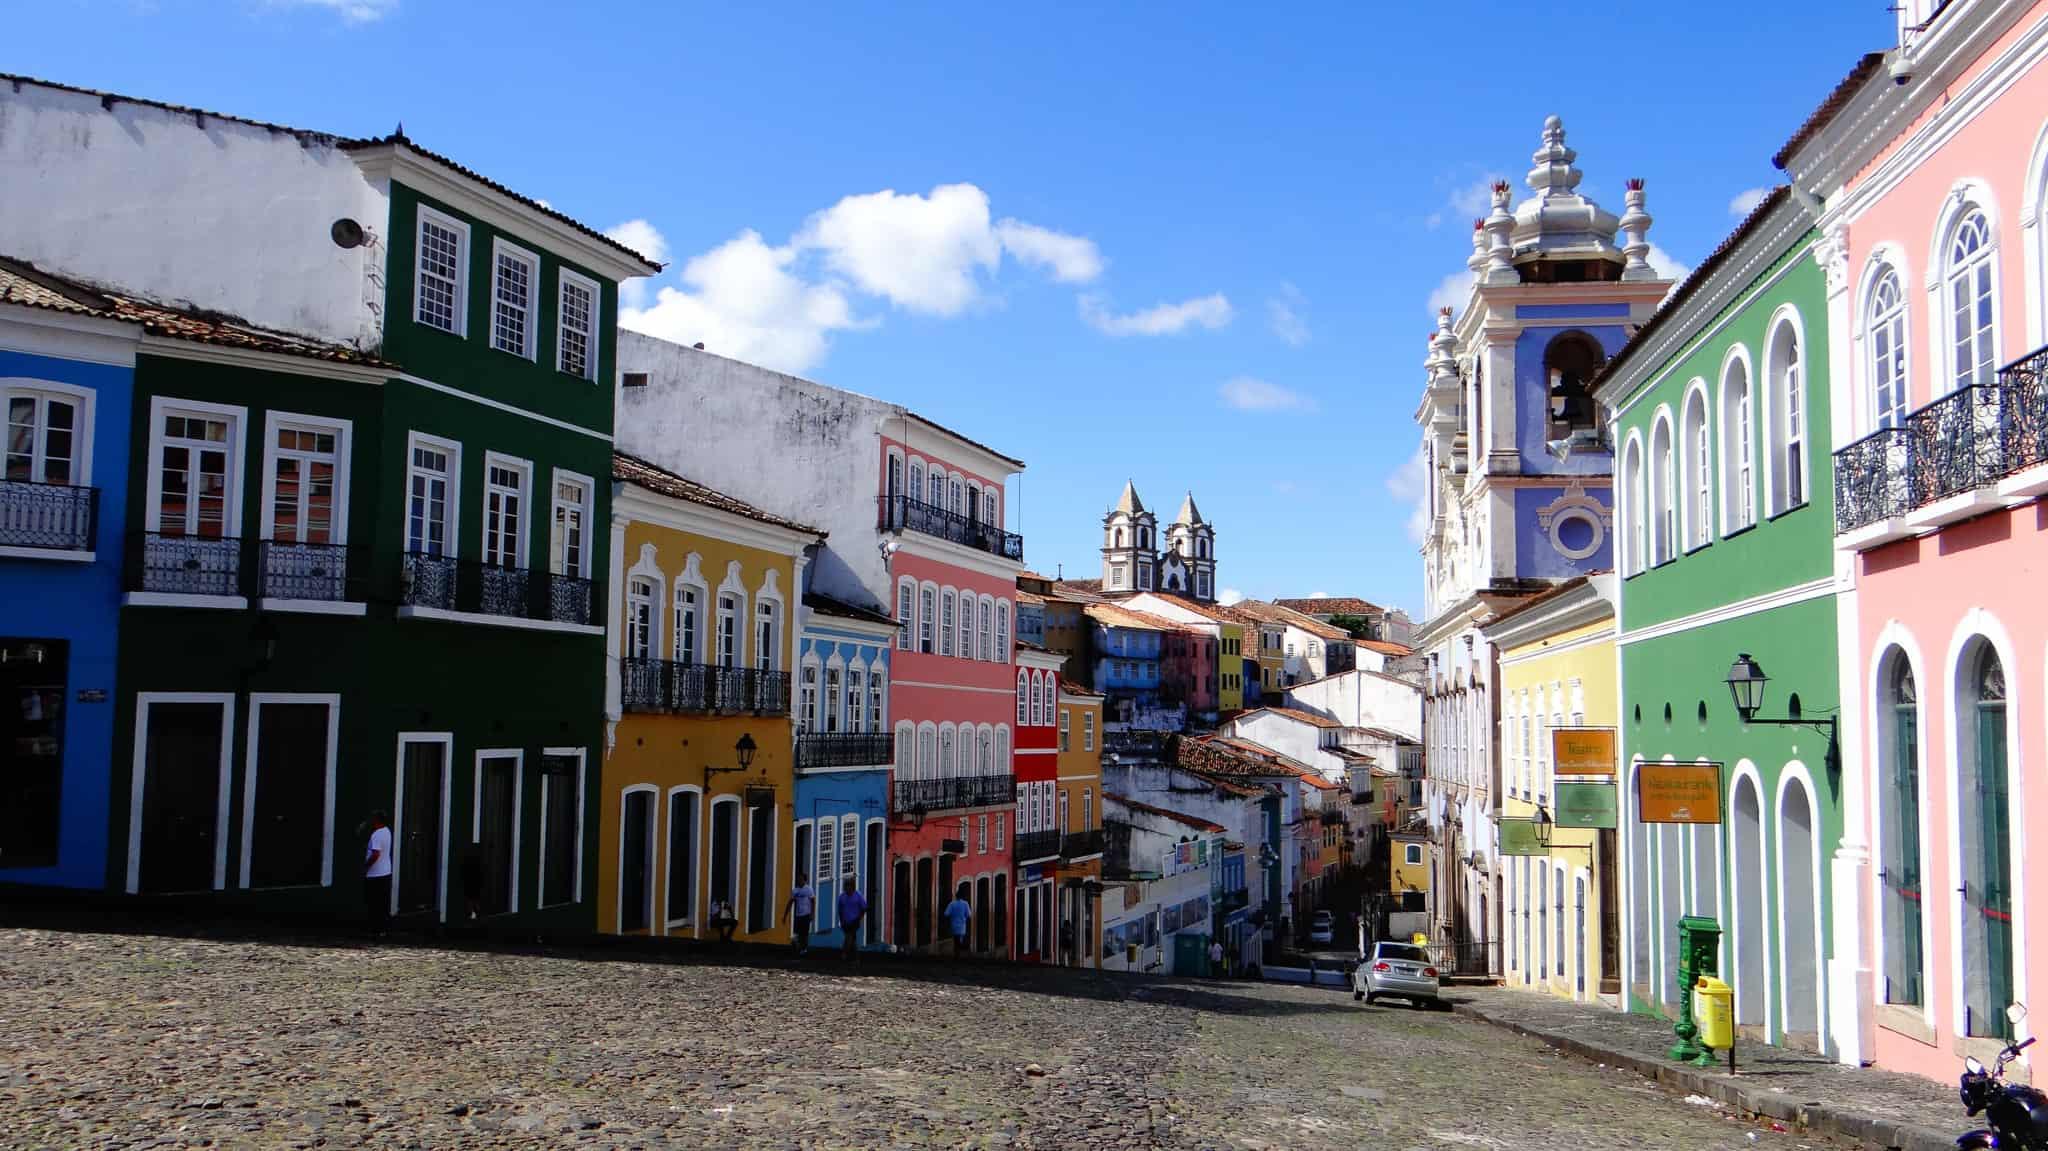 colorful old buildings surrounding a cobblestone square